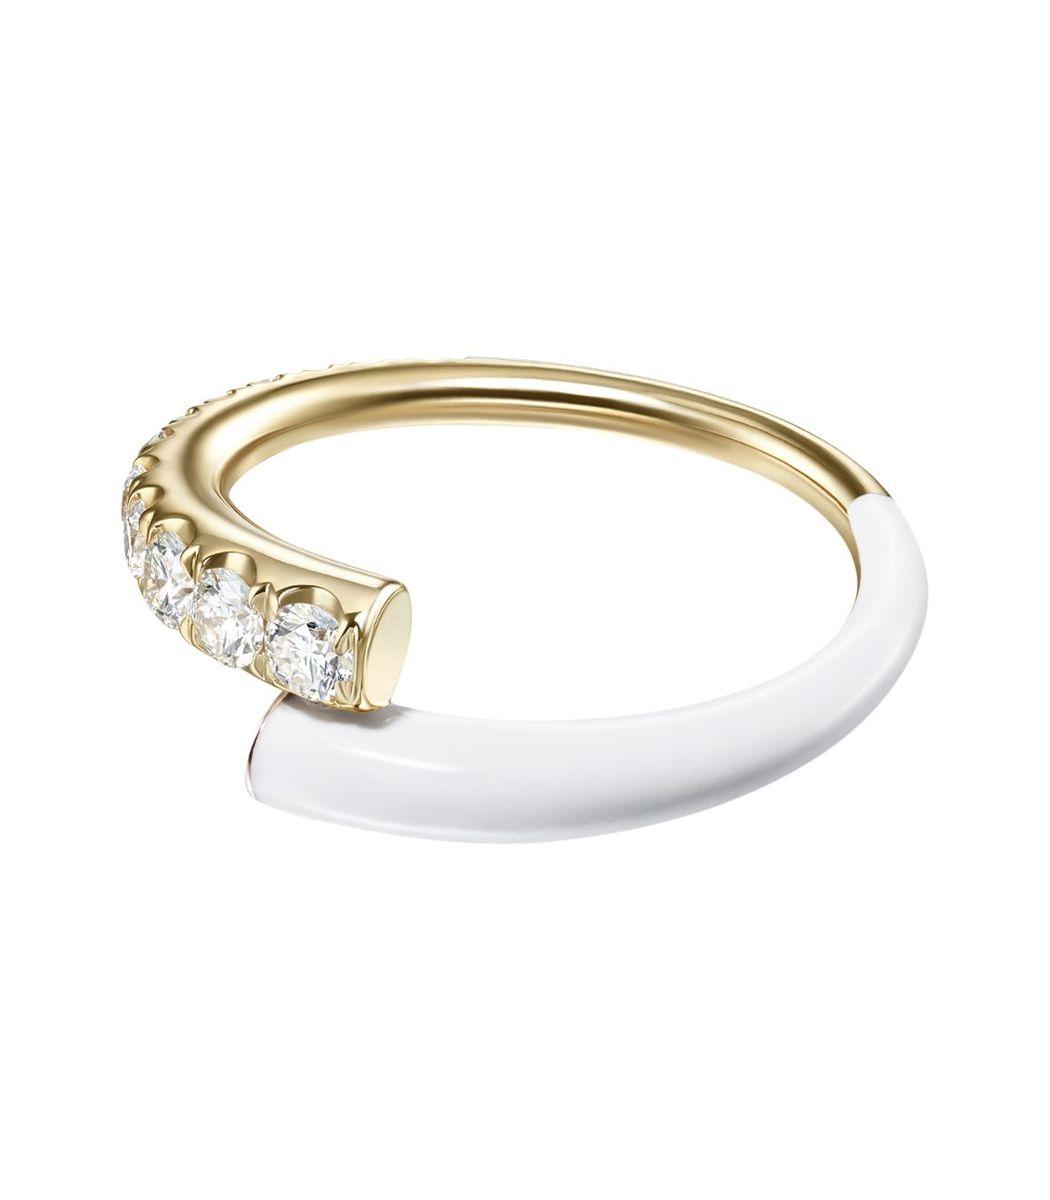 MELISSA KAYE Lola Ring